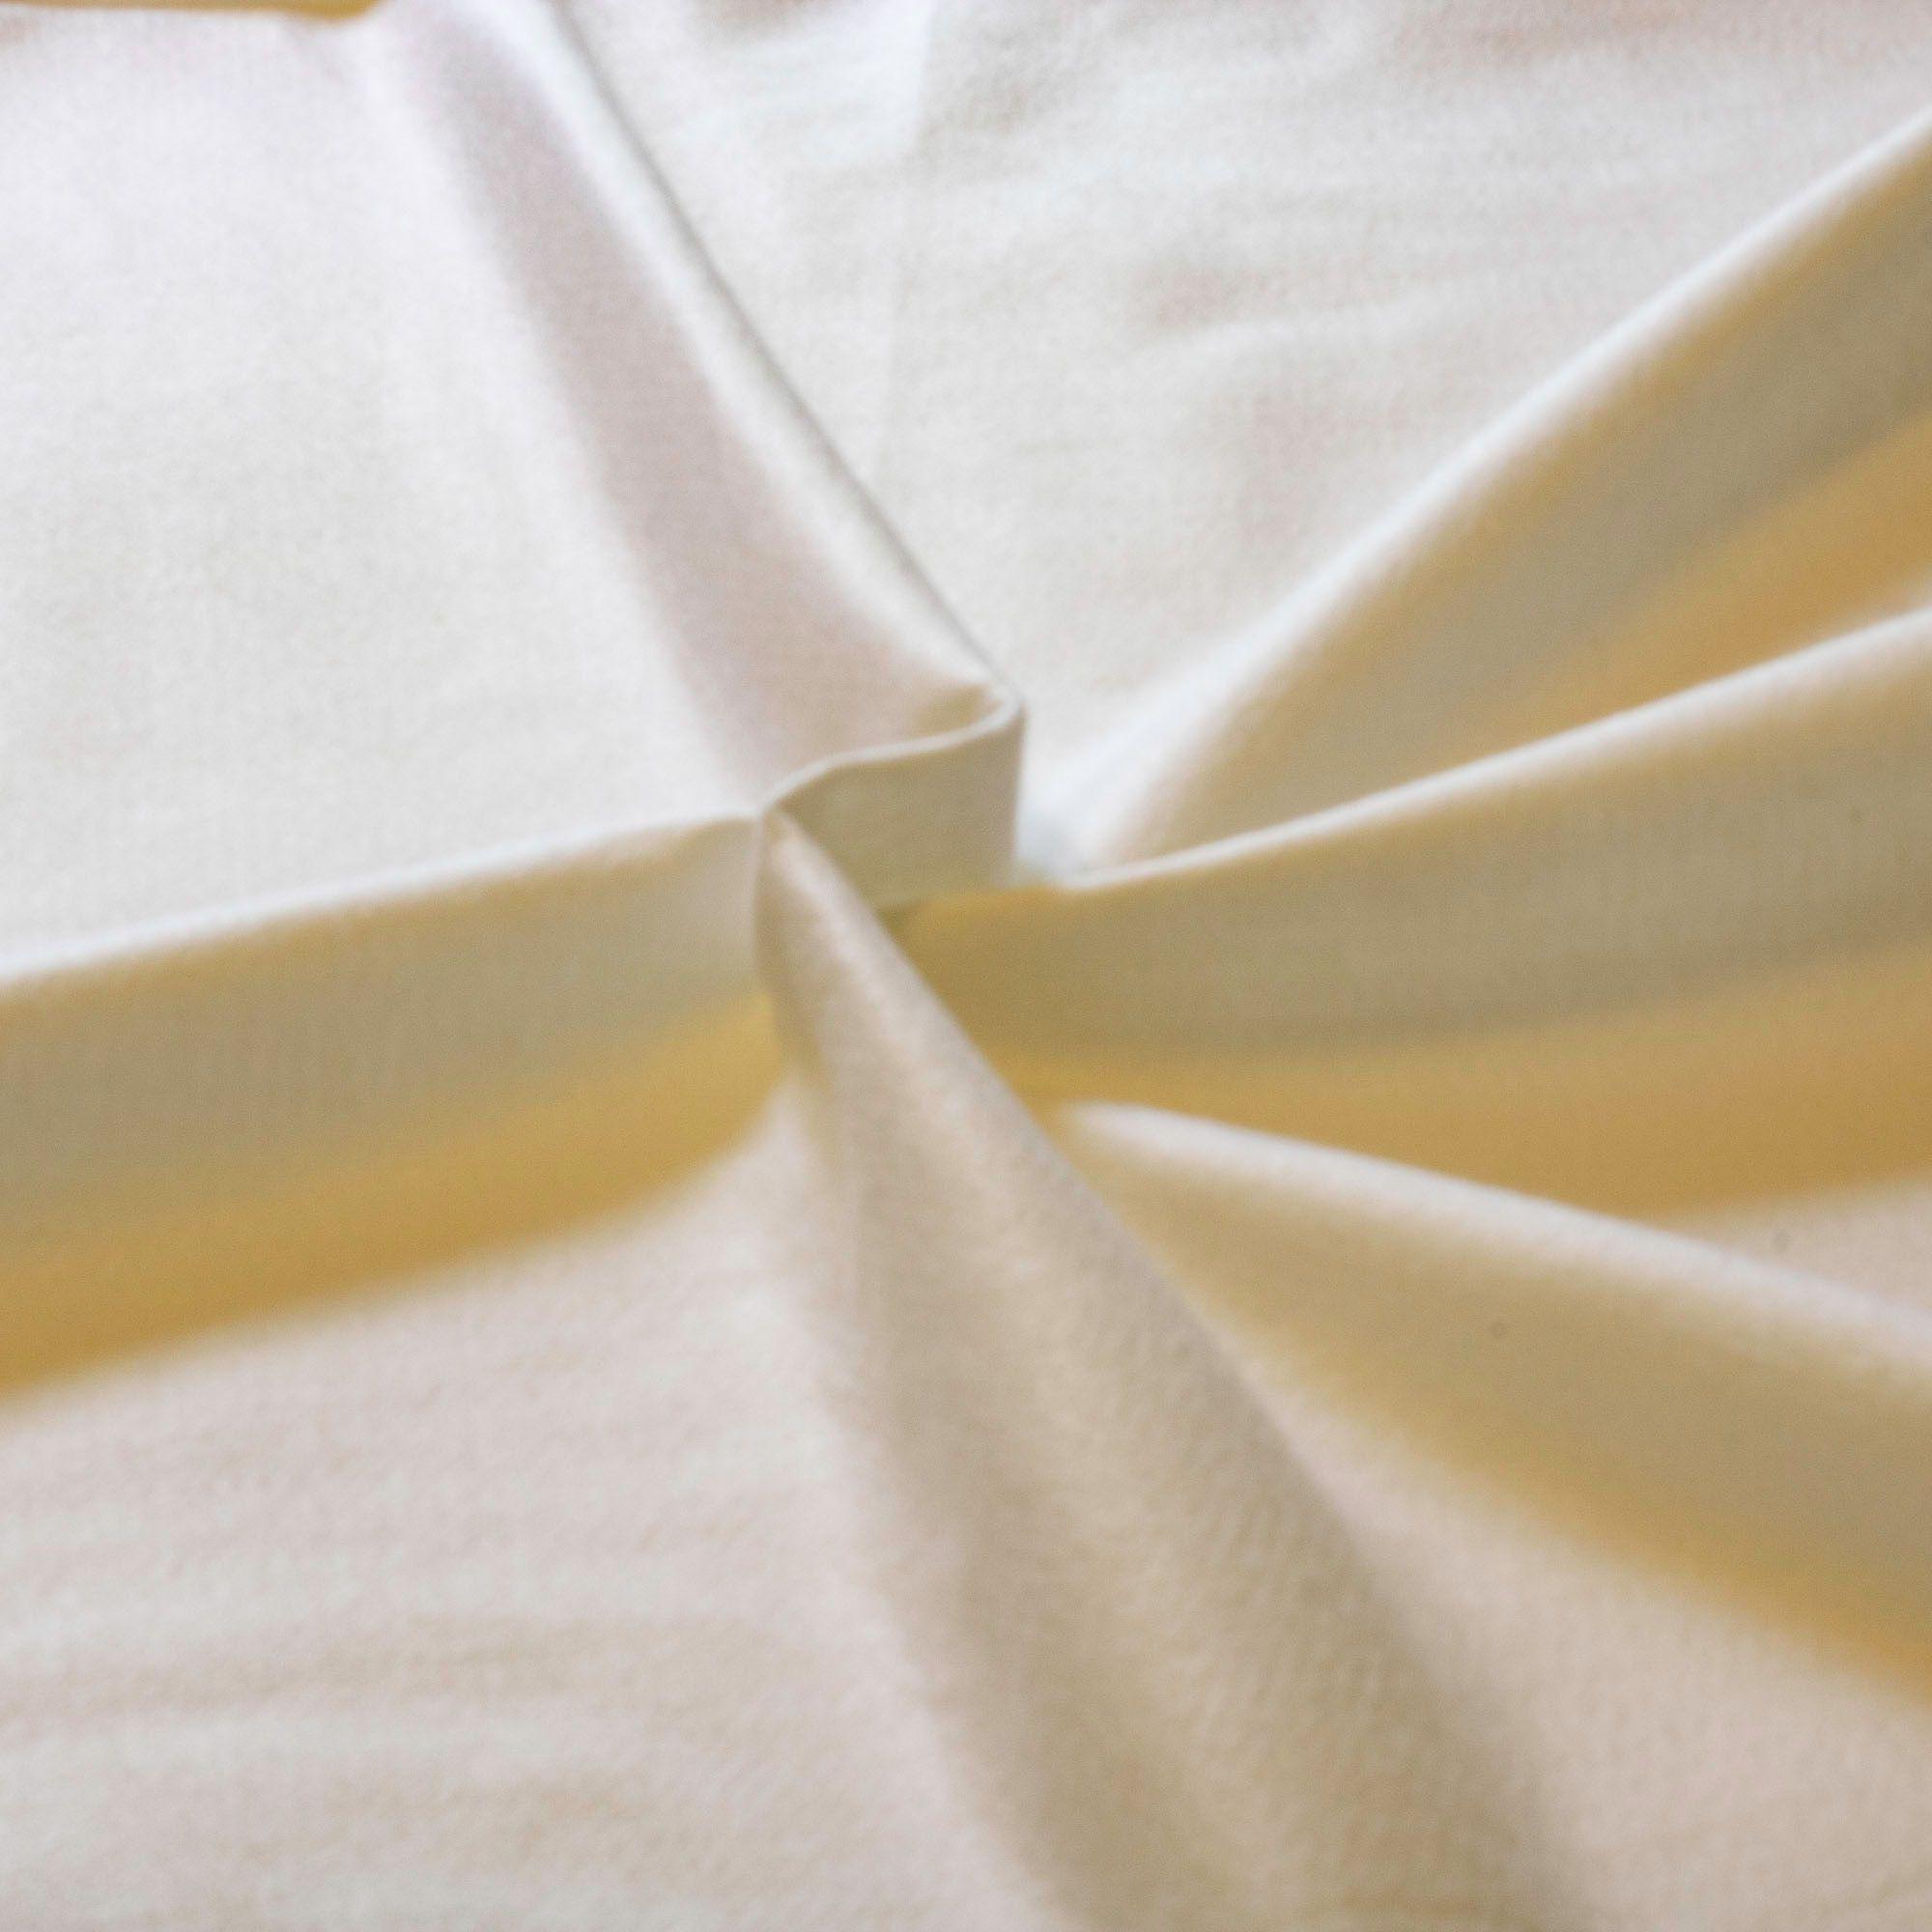 Tecido Feltro Branco 100% Poliester 1 465c893f186